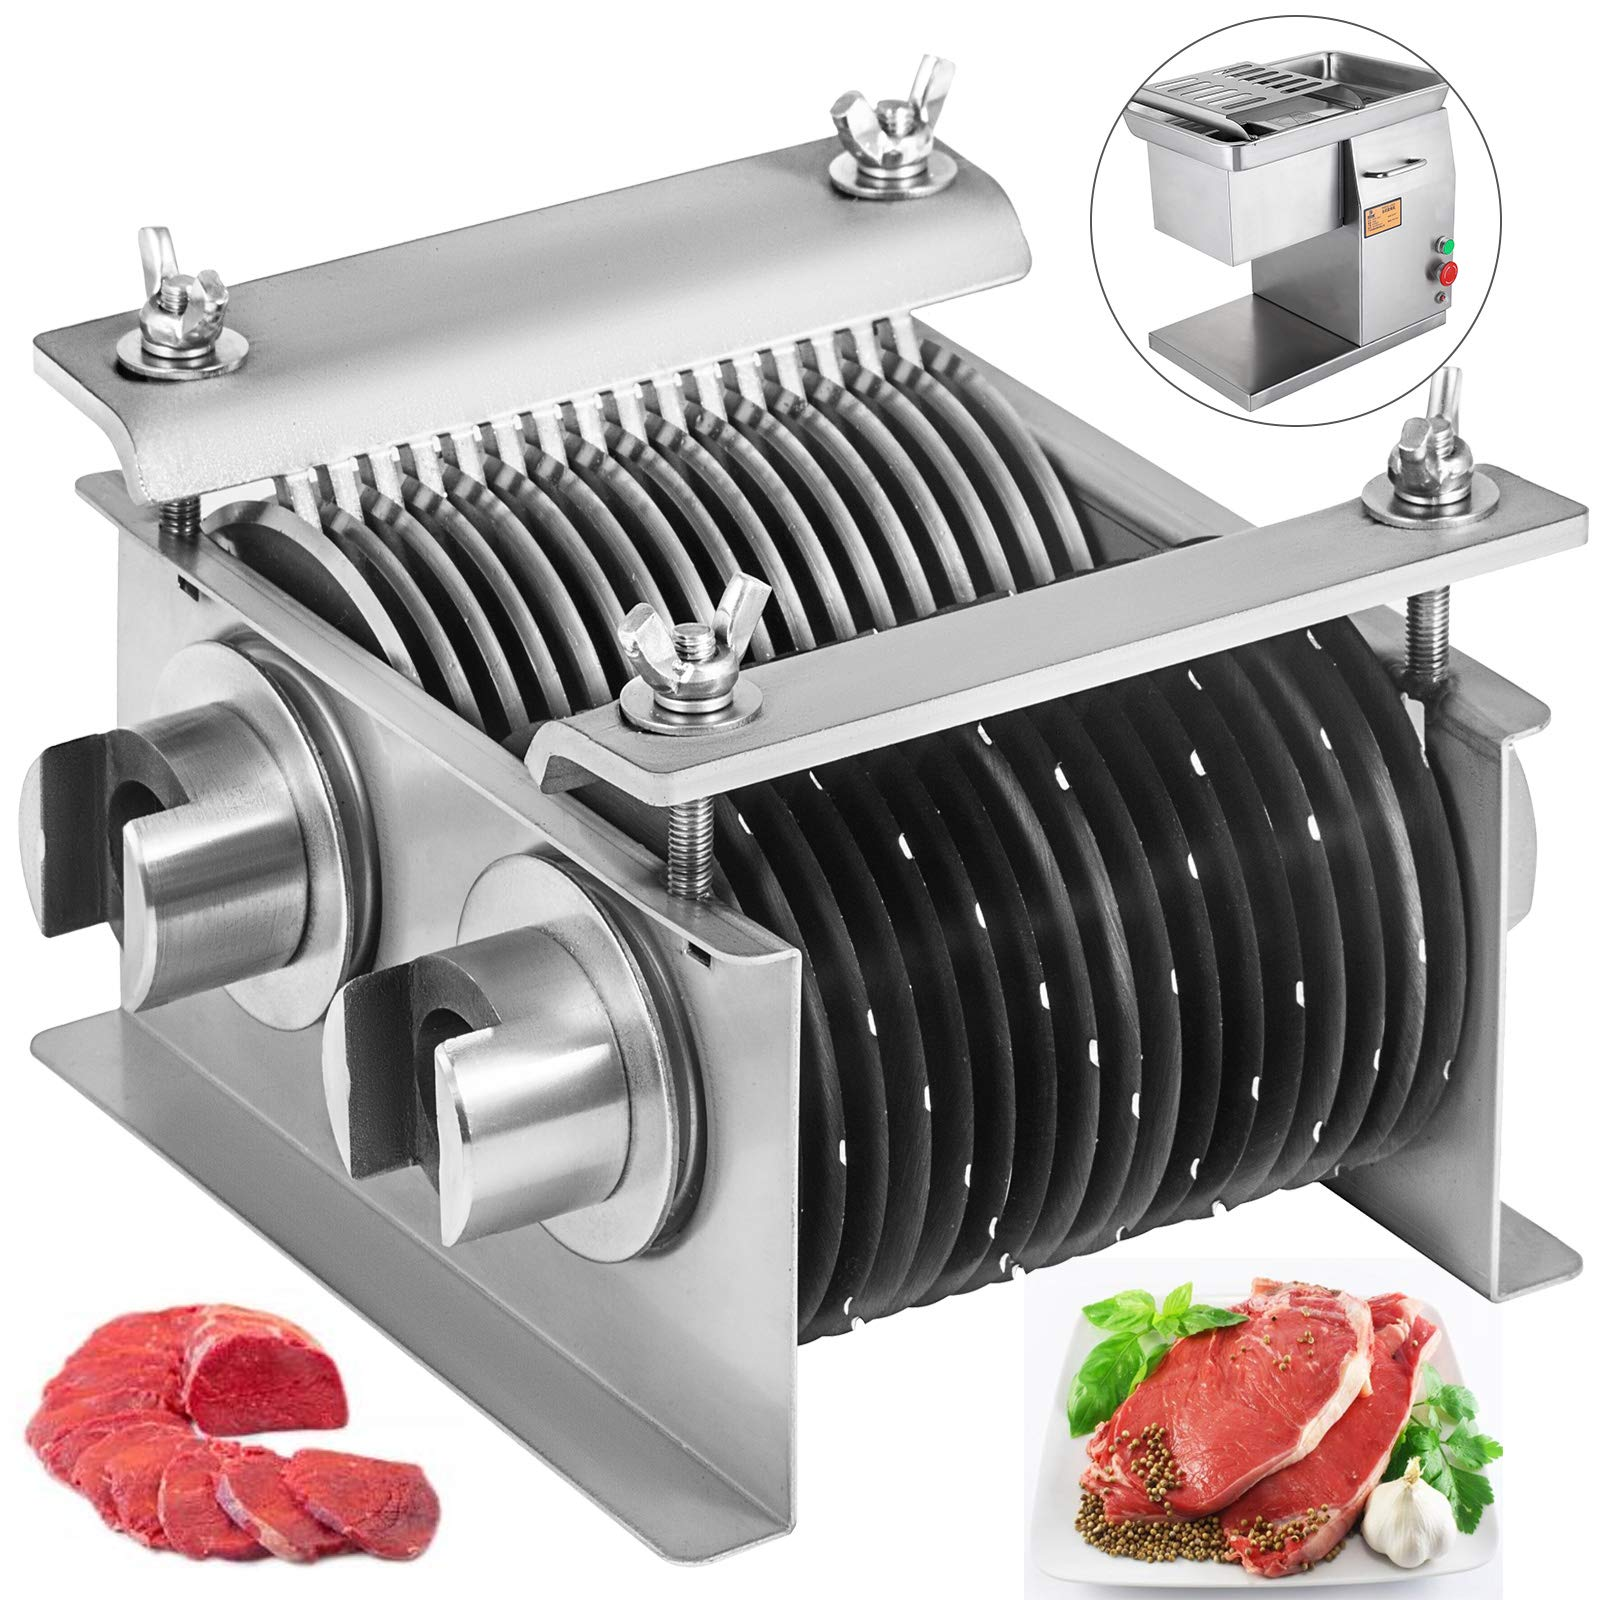 BestEquip One Set Blade 5mm for Desktop Meat Slicer 660 LB/H 500W Meat Cutting Machine 5mm Blade by BestEquip